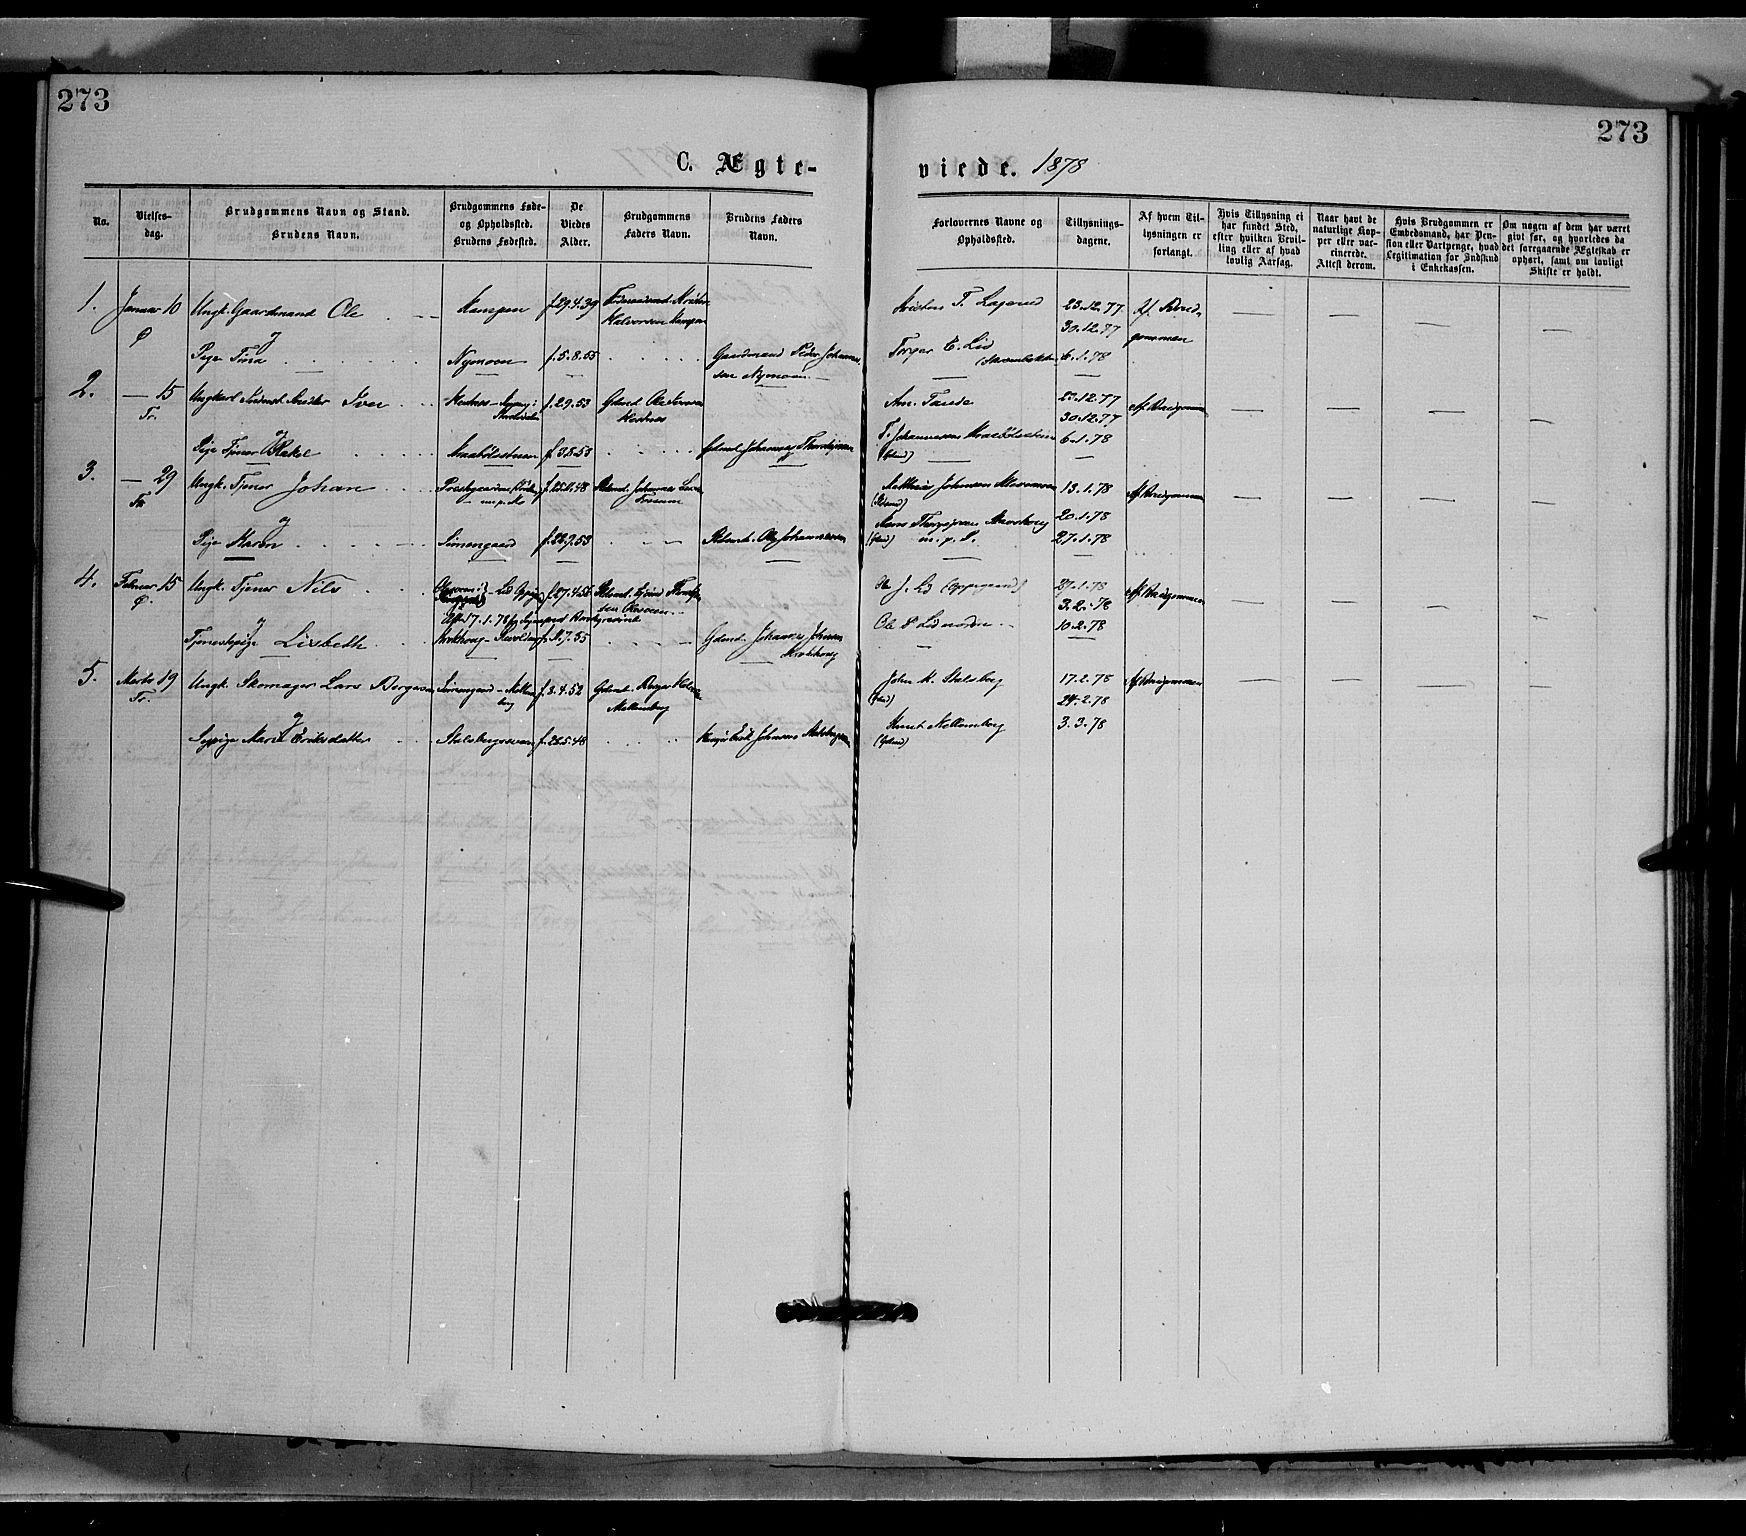 SAH, Øyer prestekontor, Ministerialbok nr. 7, 1875-1878, s. 273